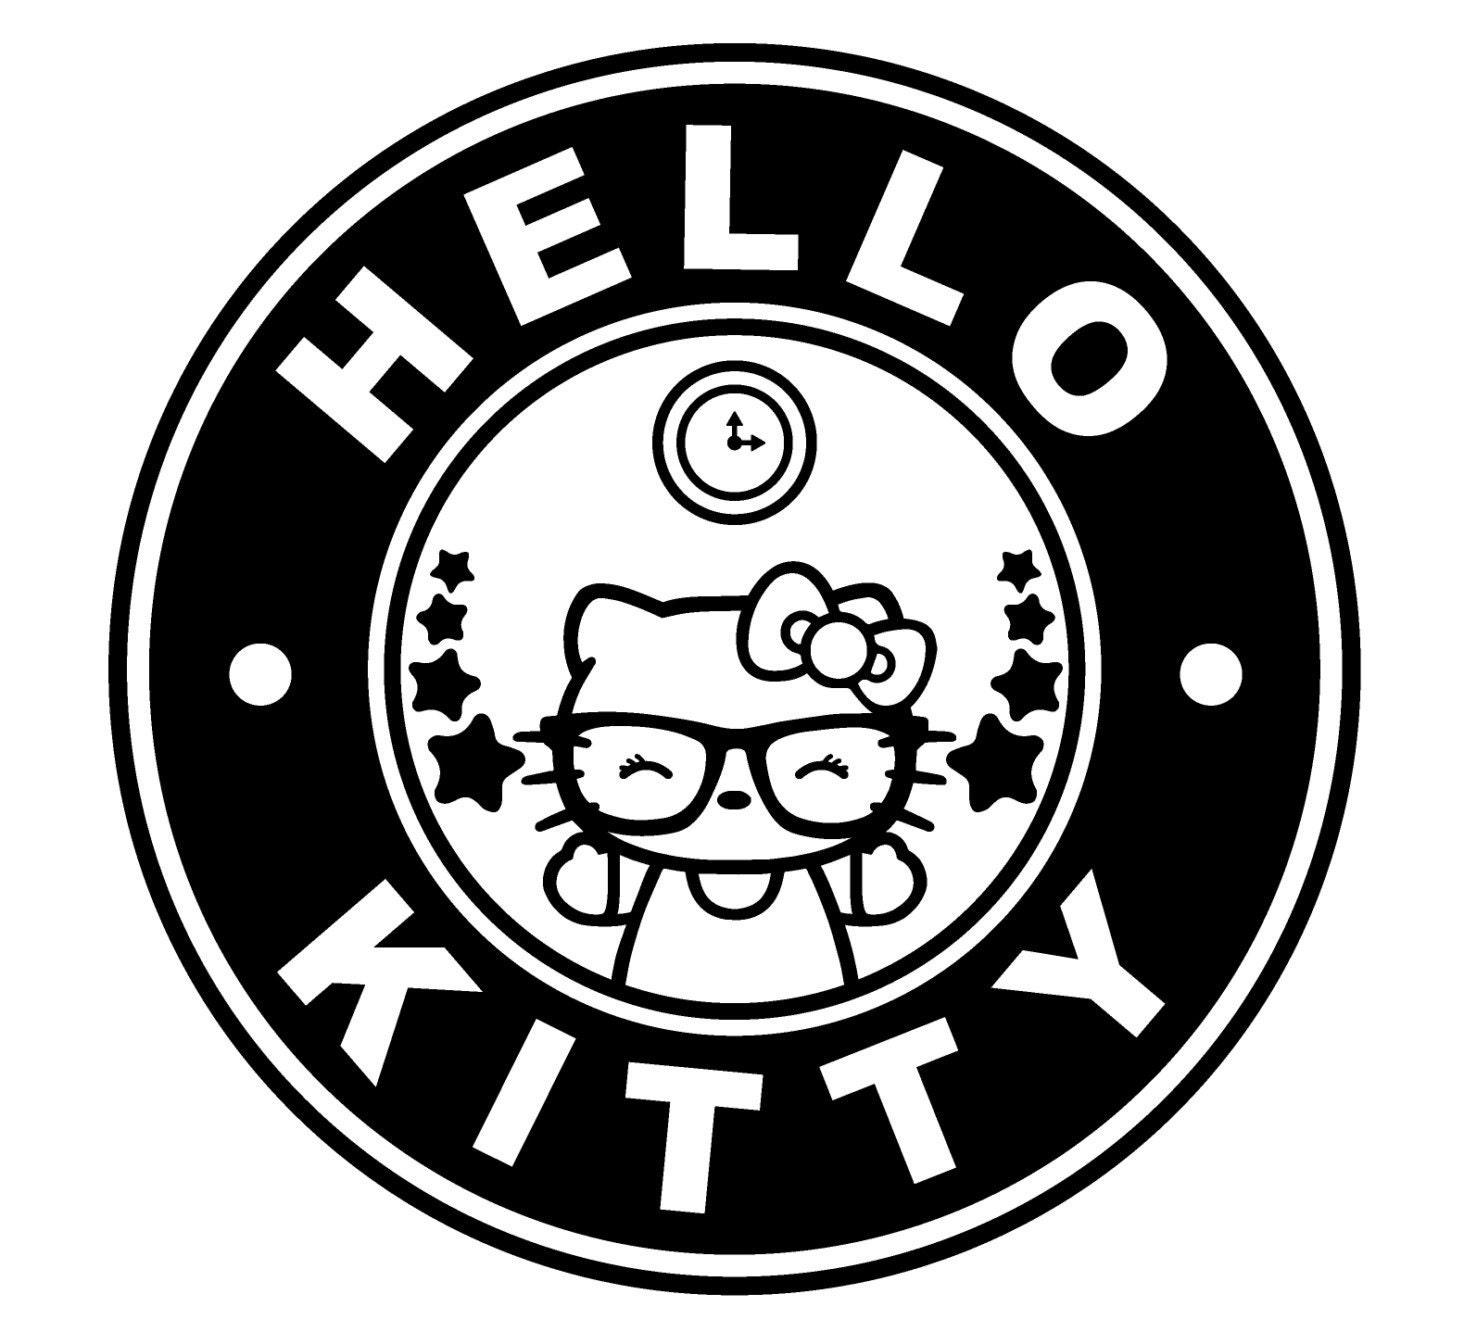 Starbucks create your own logo joy studio design gallery for Draw your own logo free